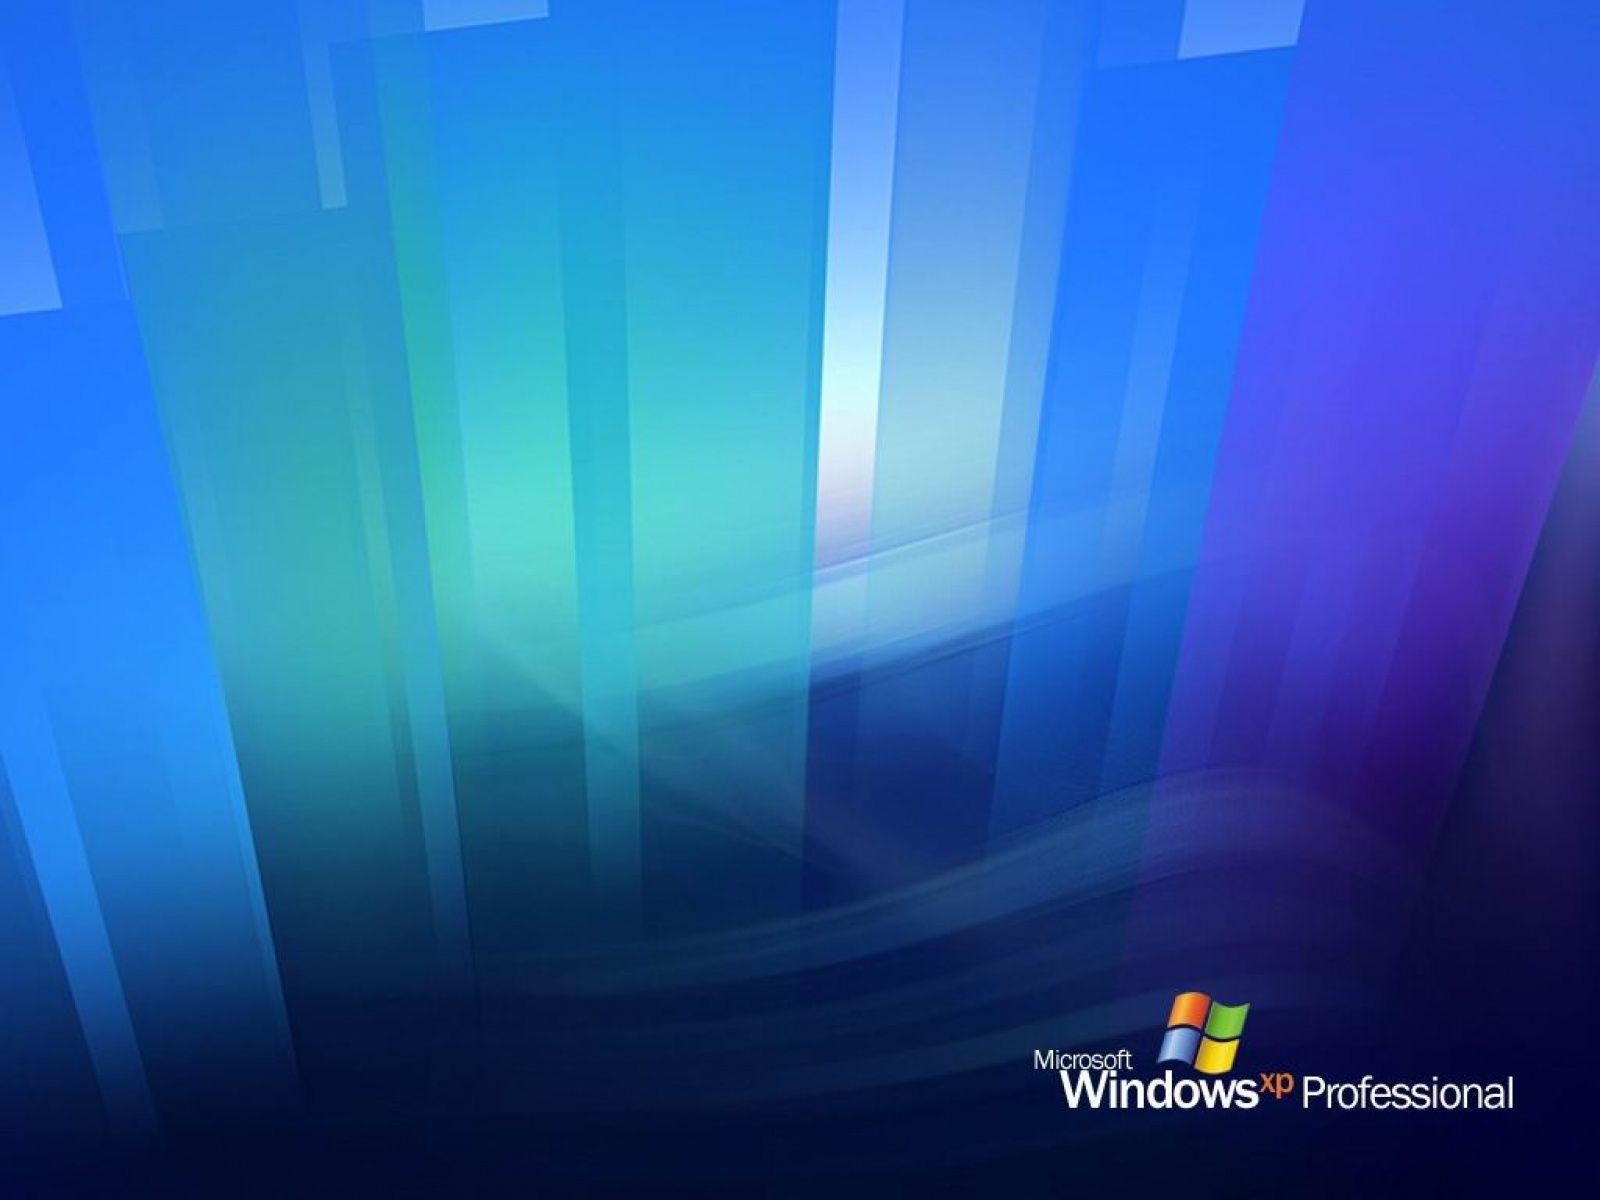 Windows XP Professional Wallpapers - Top Free Windows XP